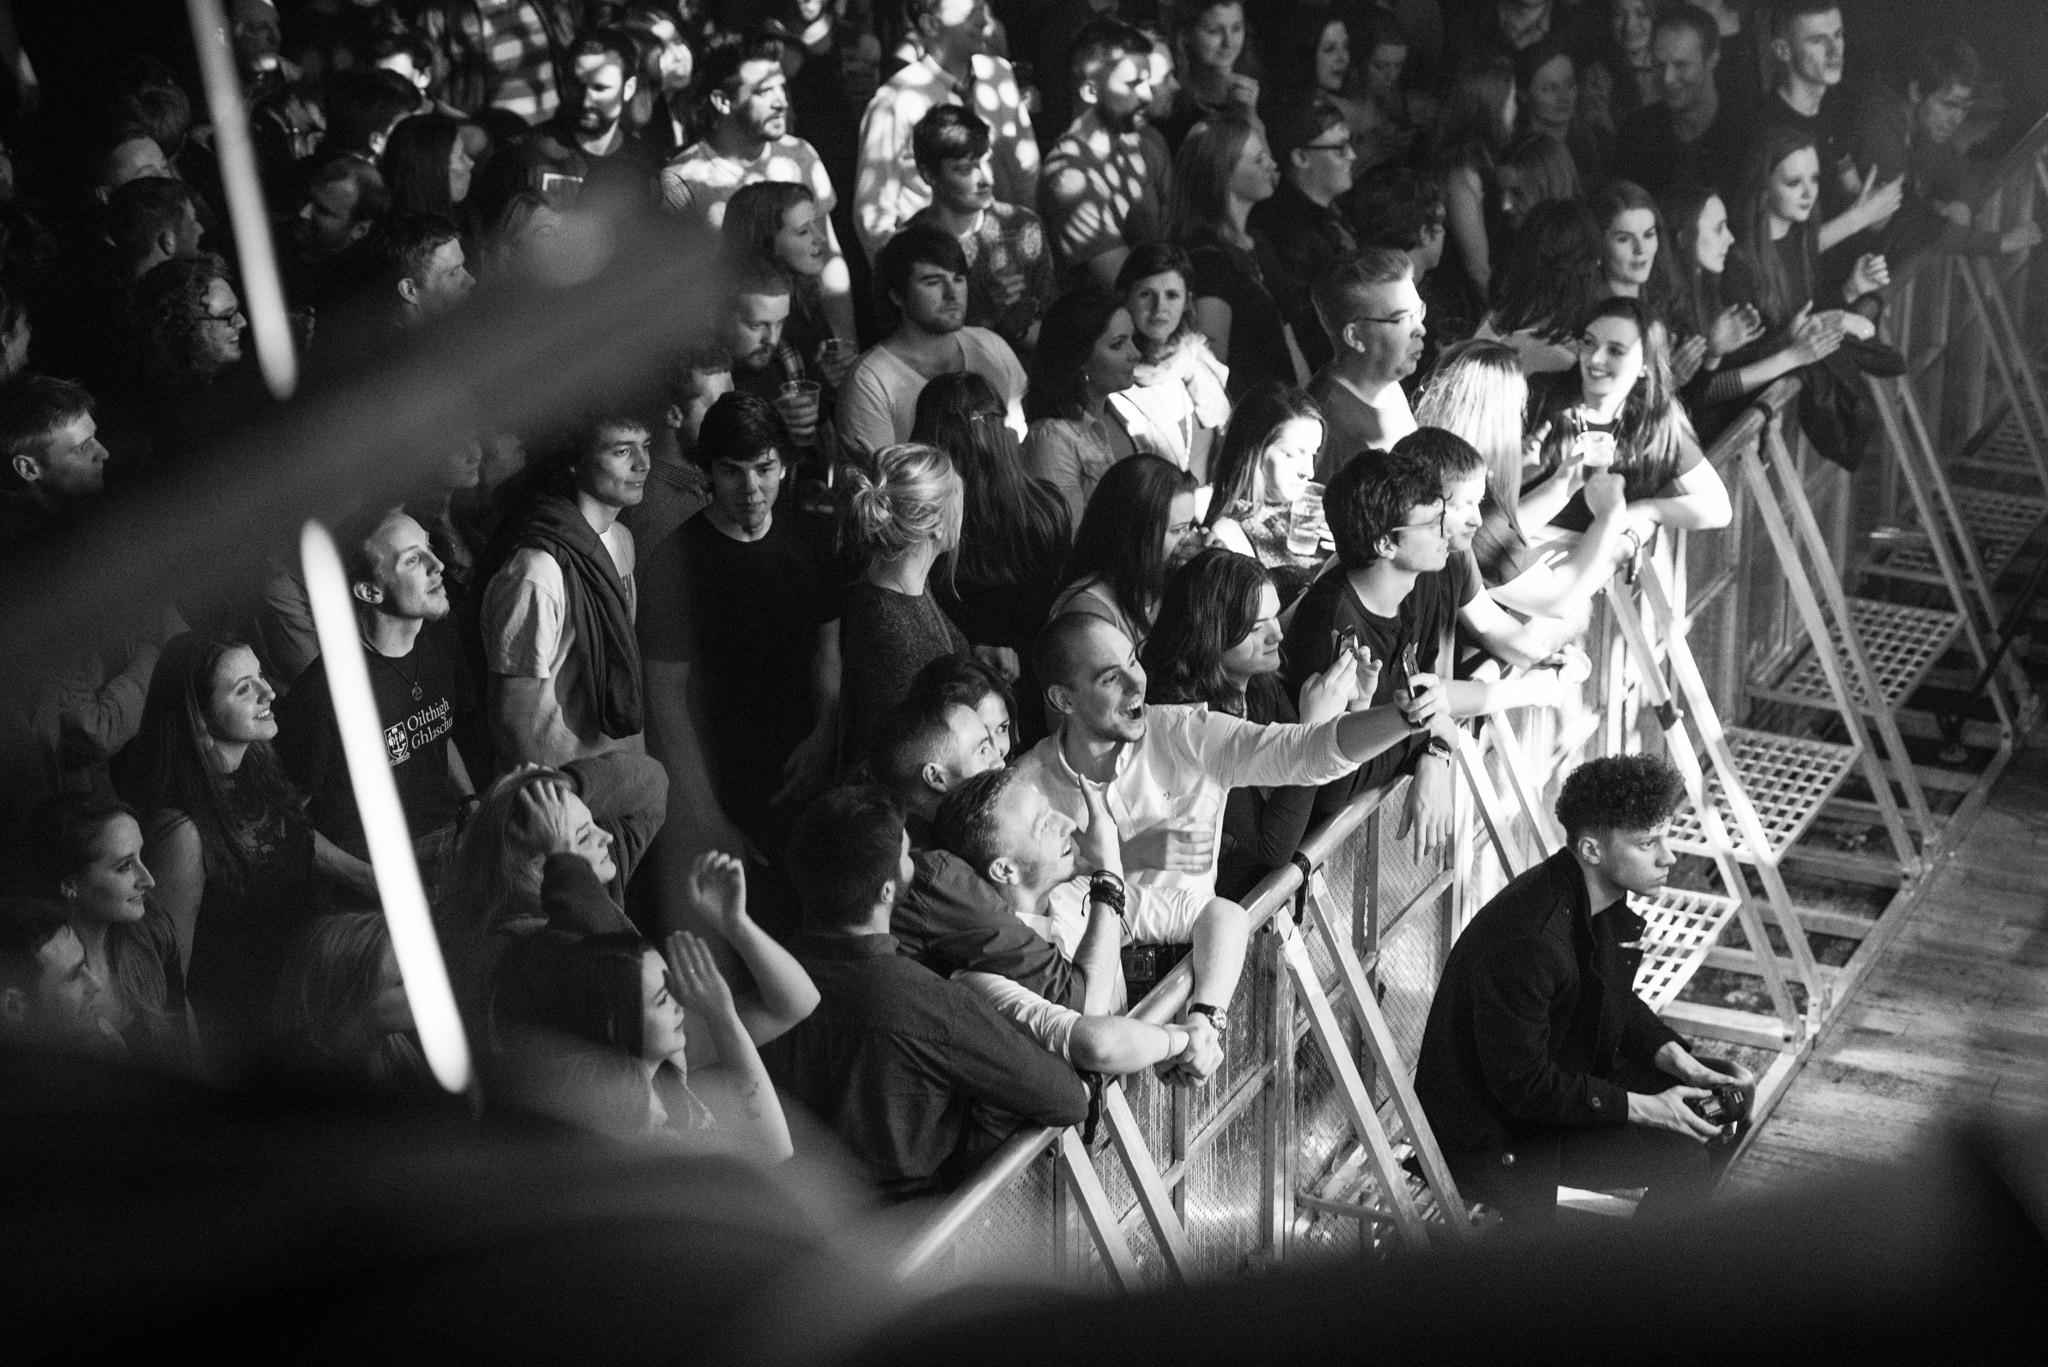 glasgow-qmu-live-gig-audience.jpg